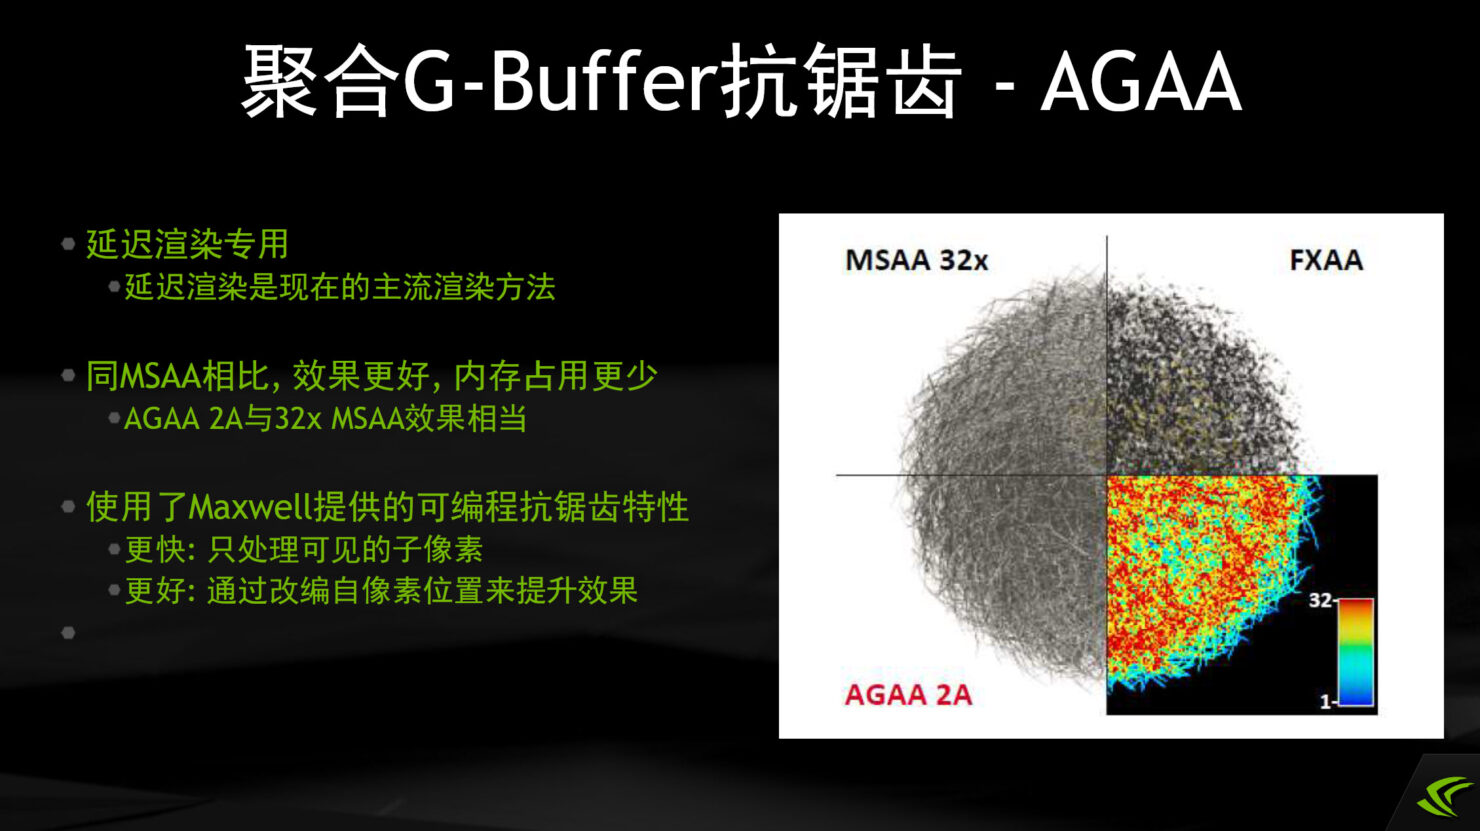 nvidia-directx-12_agaa-anti-aliasing